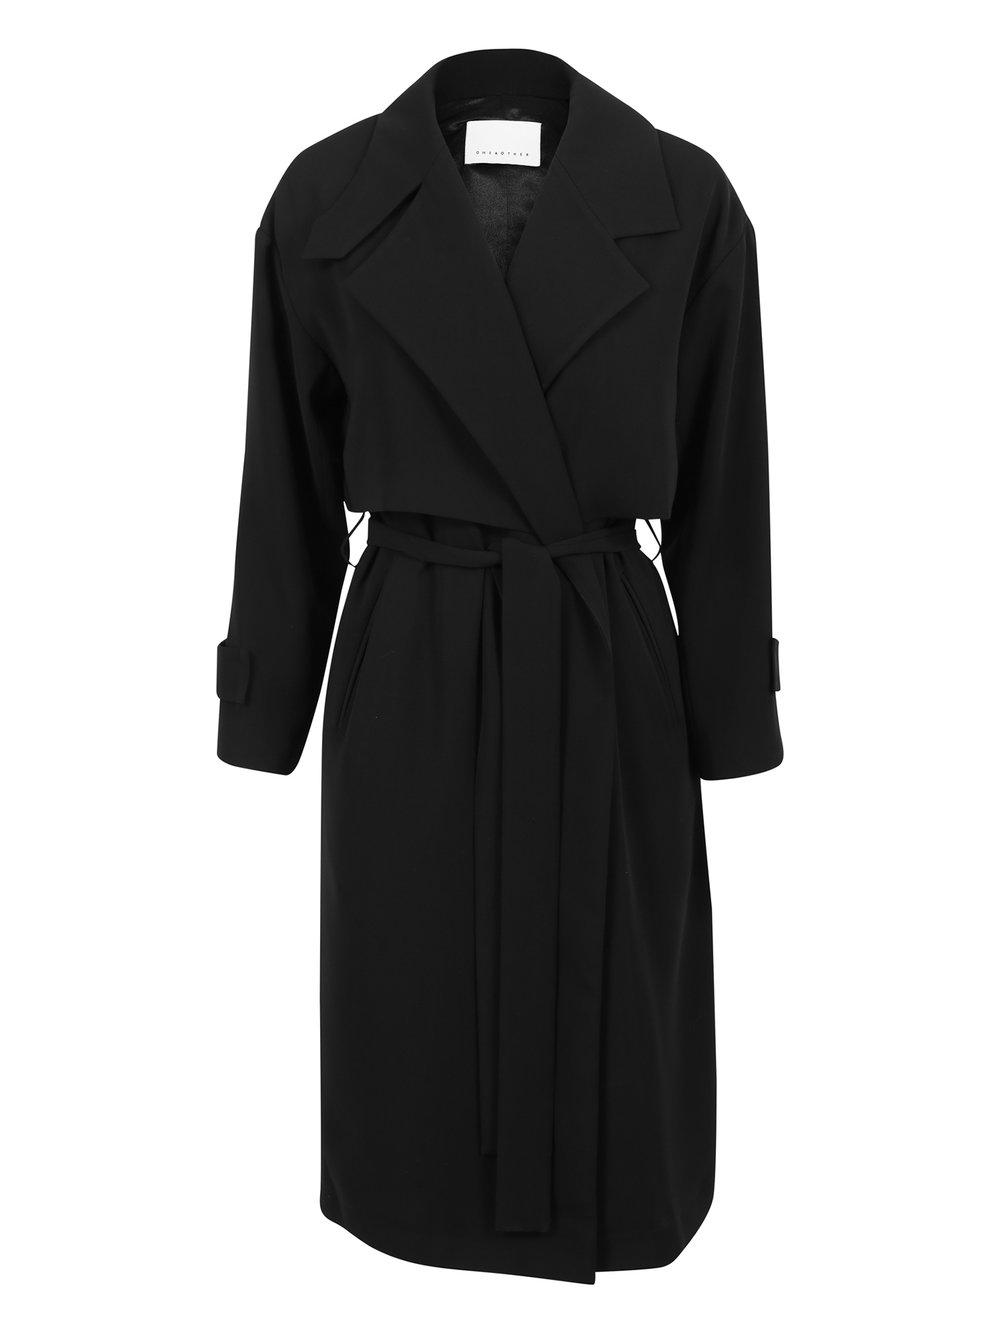 c3e7476a SHOP UTGÅTT - fashion - clothes - shop - womens - klær - mote - dame